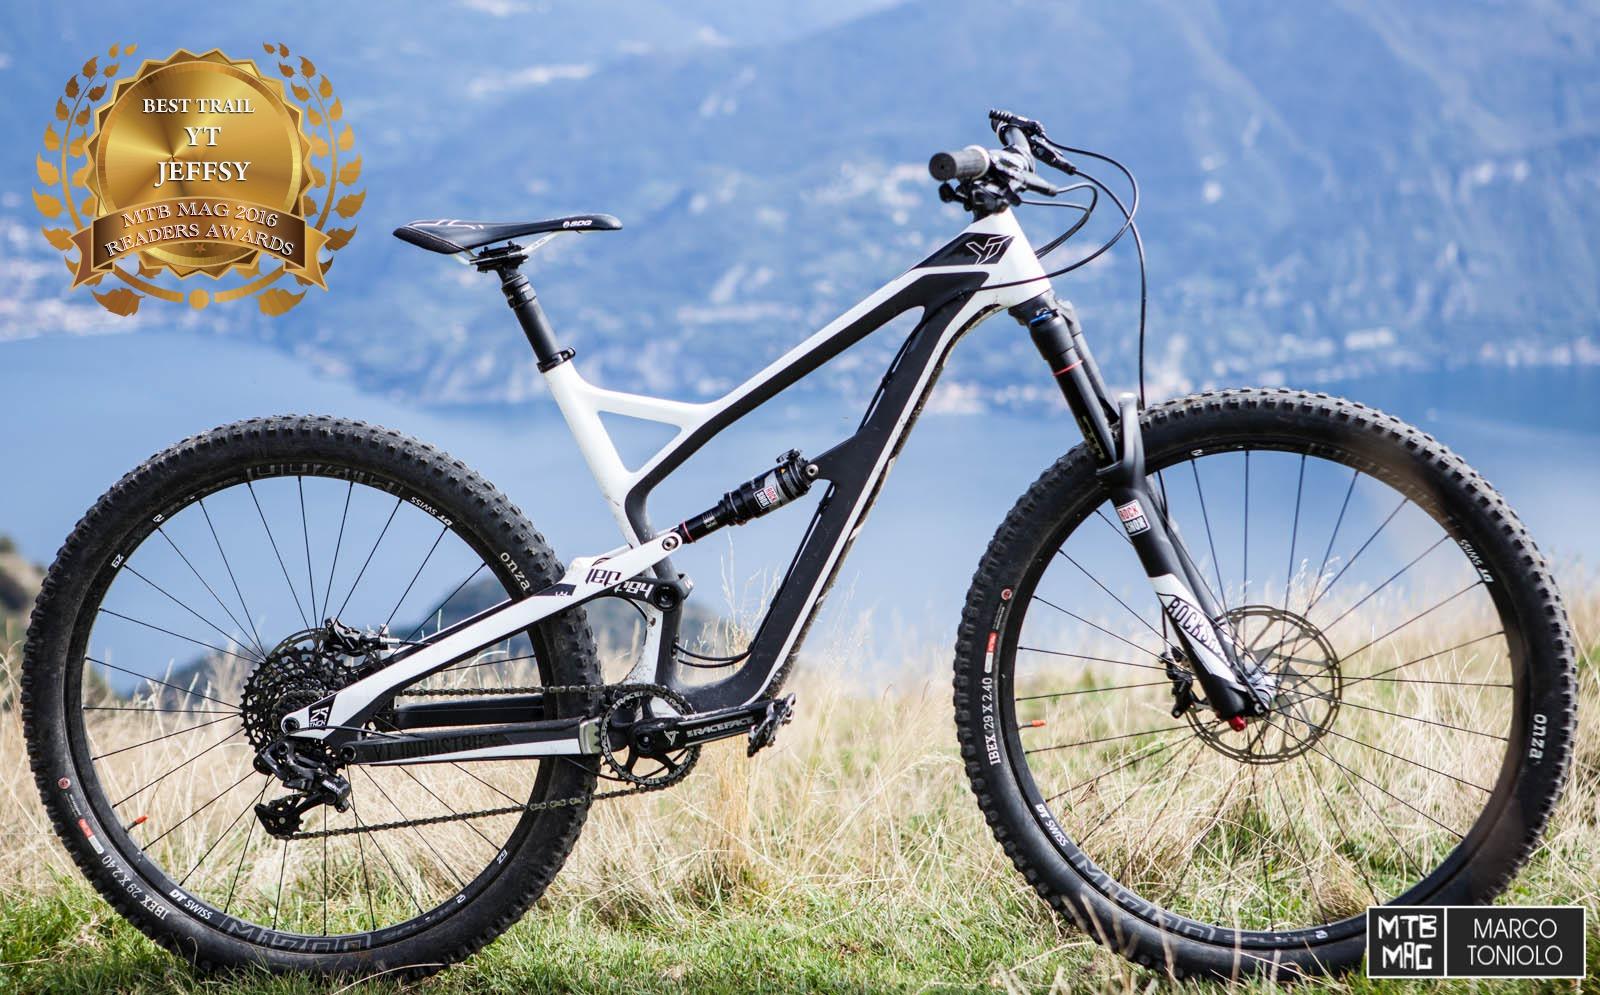 c82d7931115 MTB-MAG.COM - Mountain Bike Magazine | MTB MAG Awards 2016: YT ...